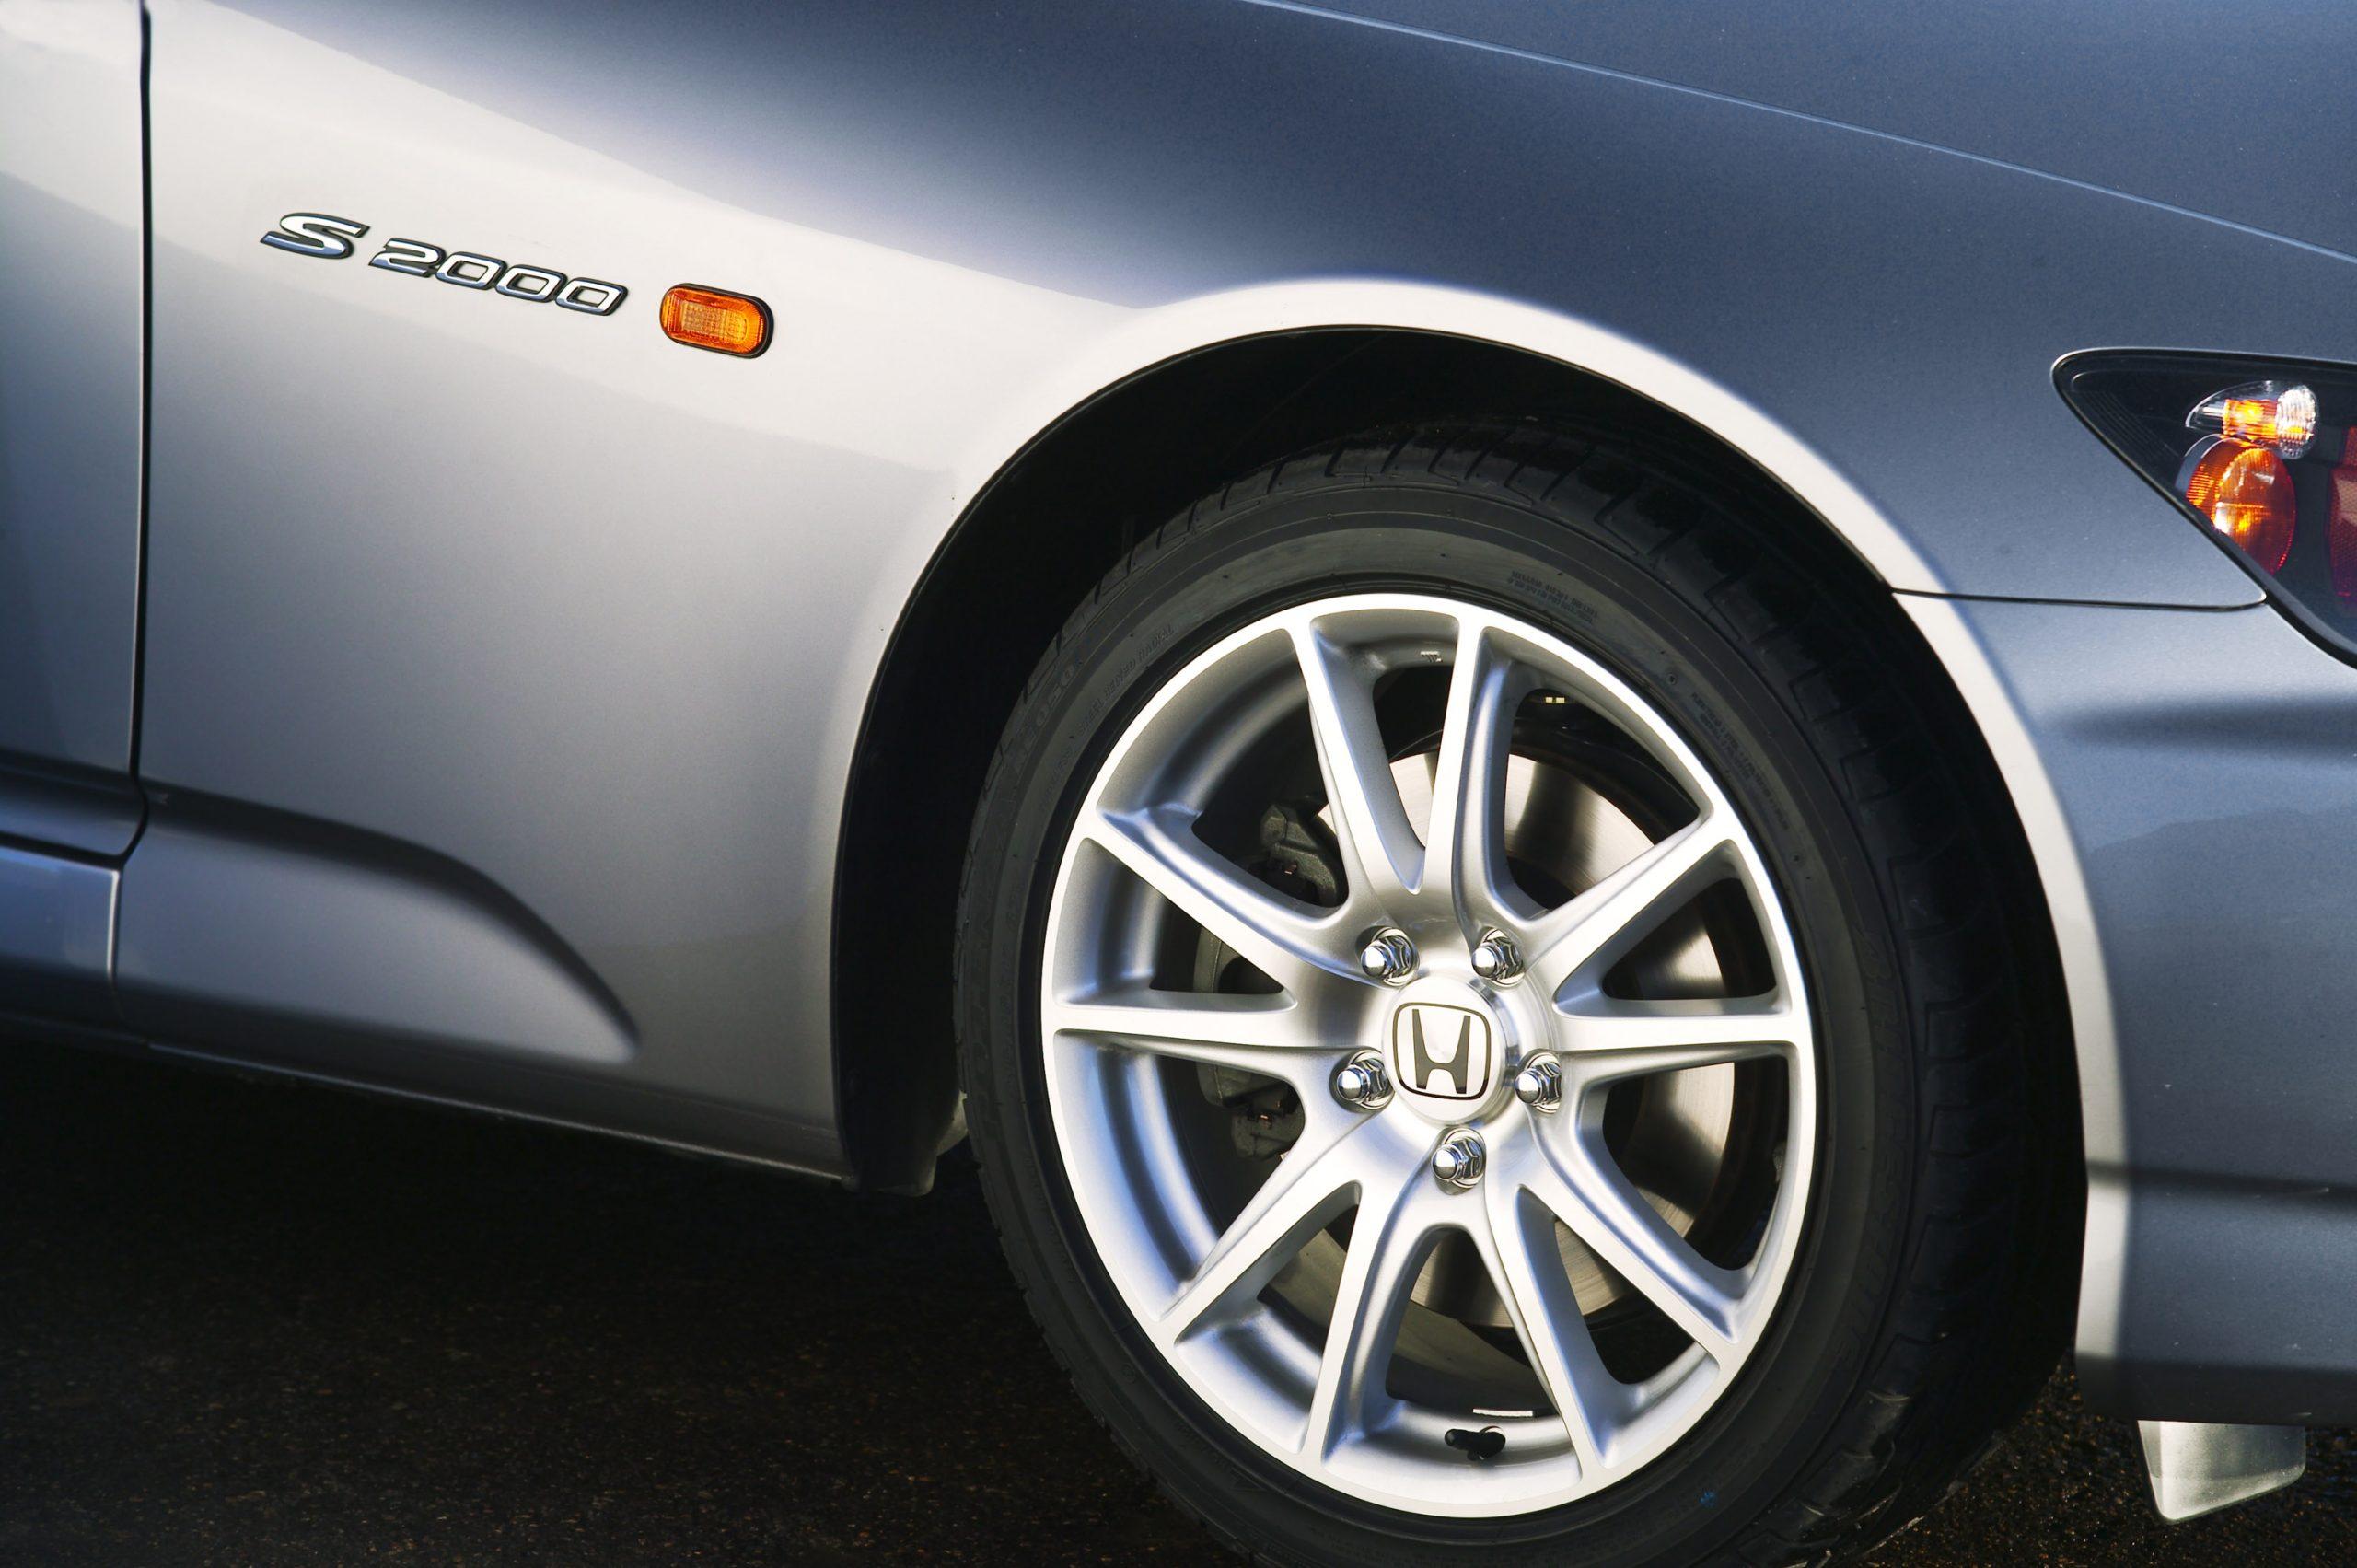 2004 Honda S2000 front wheel